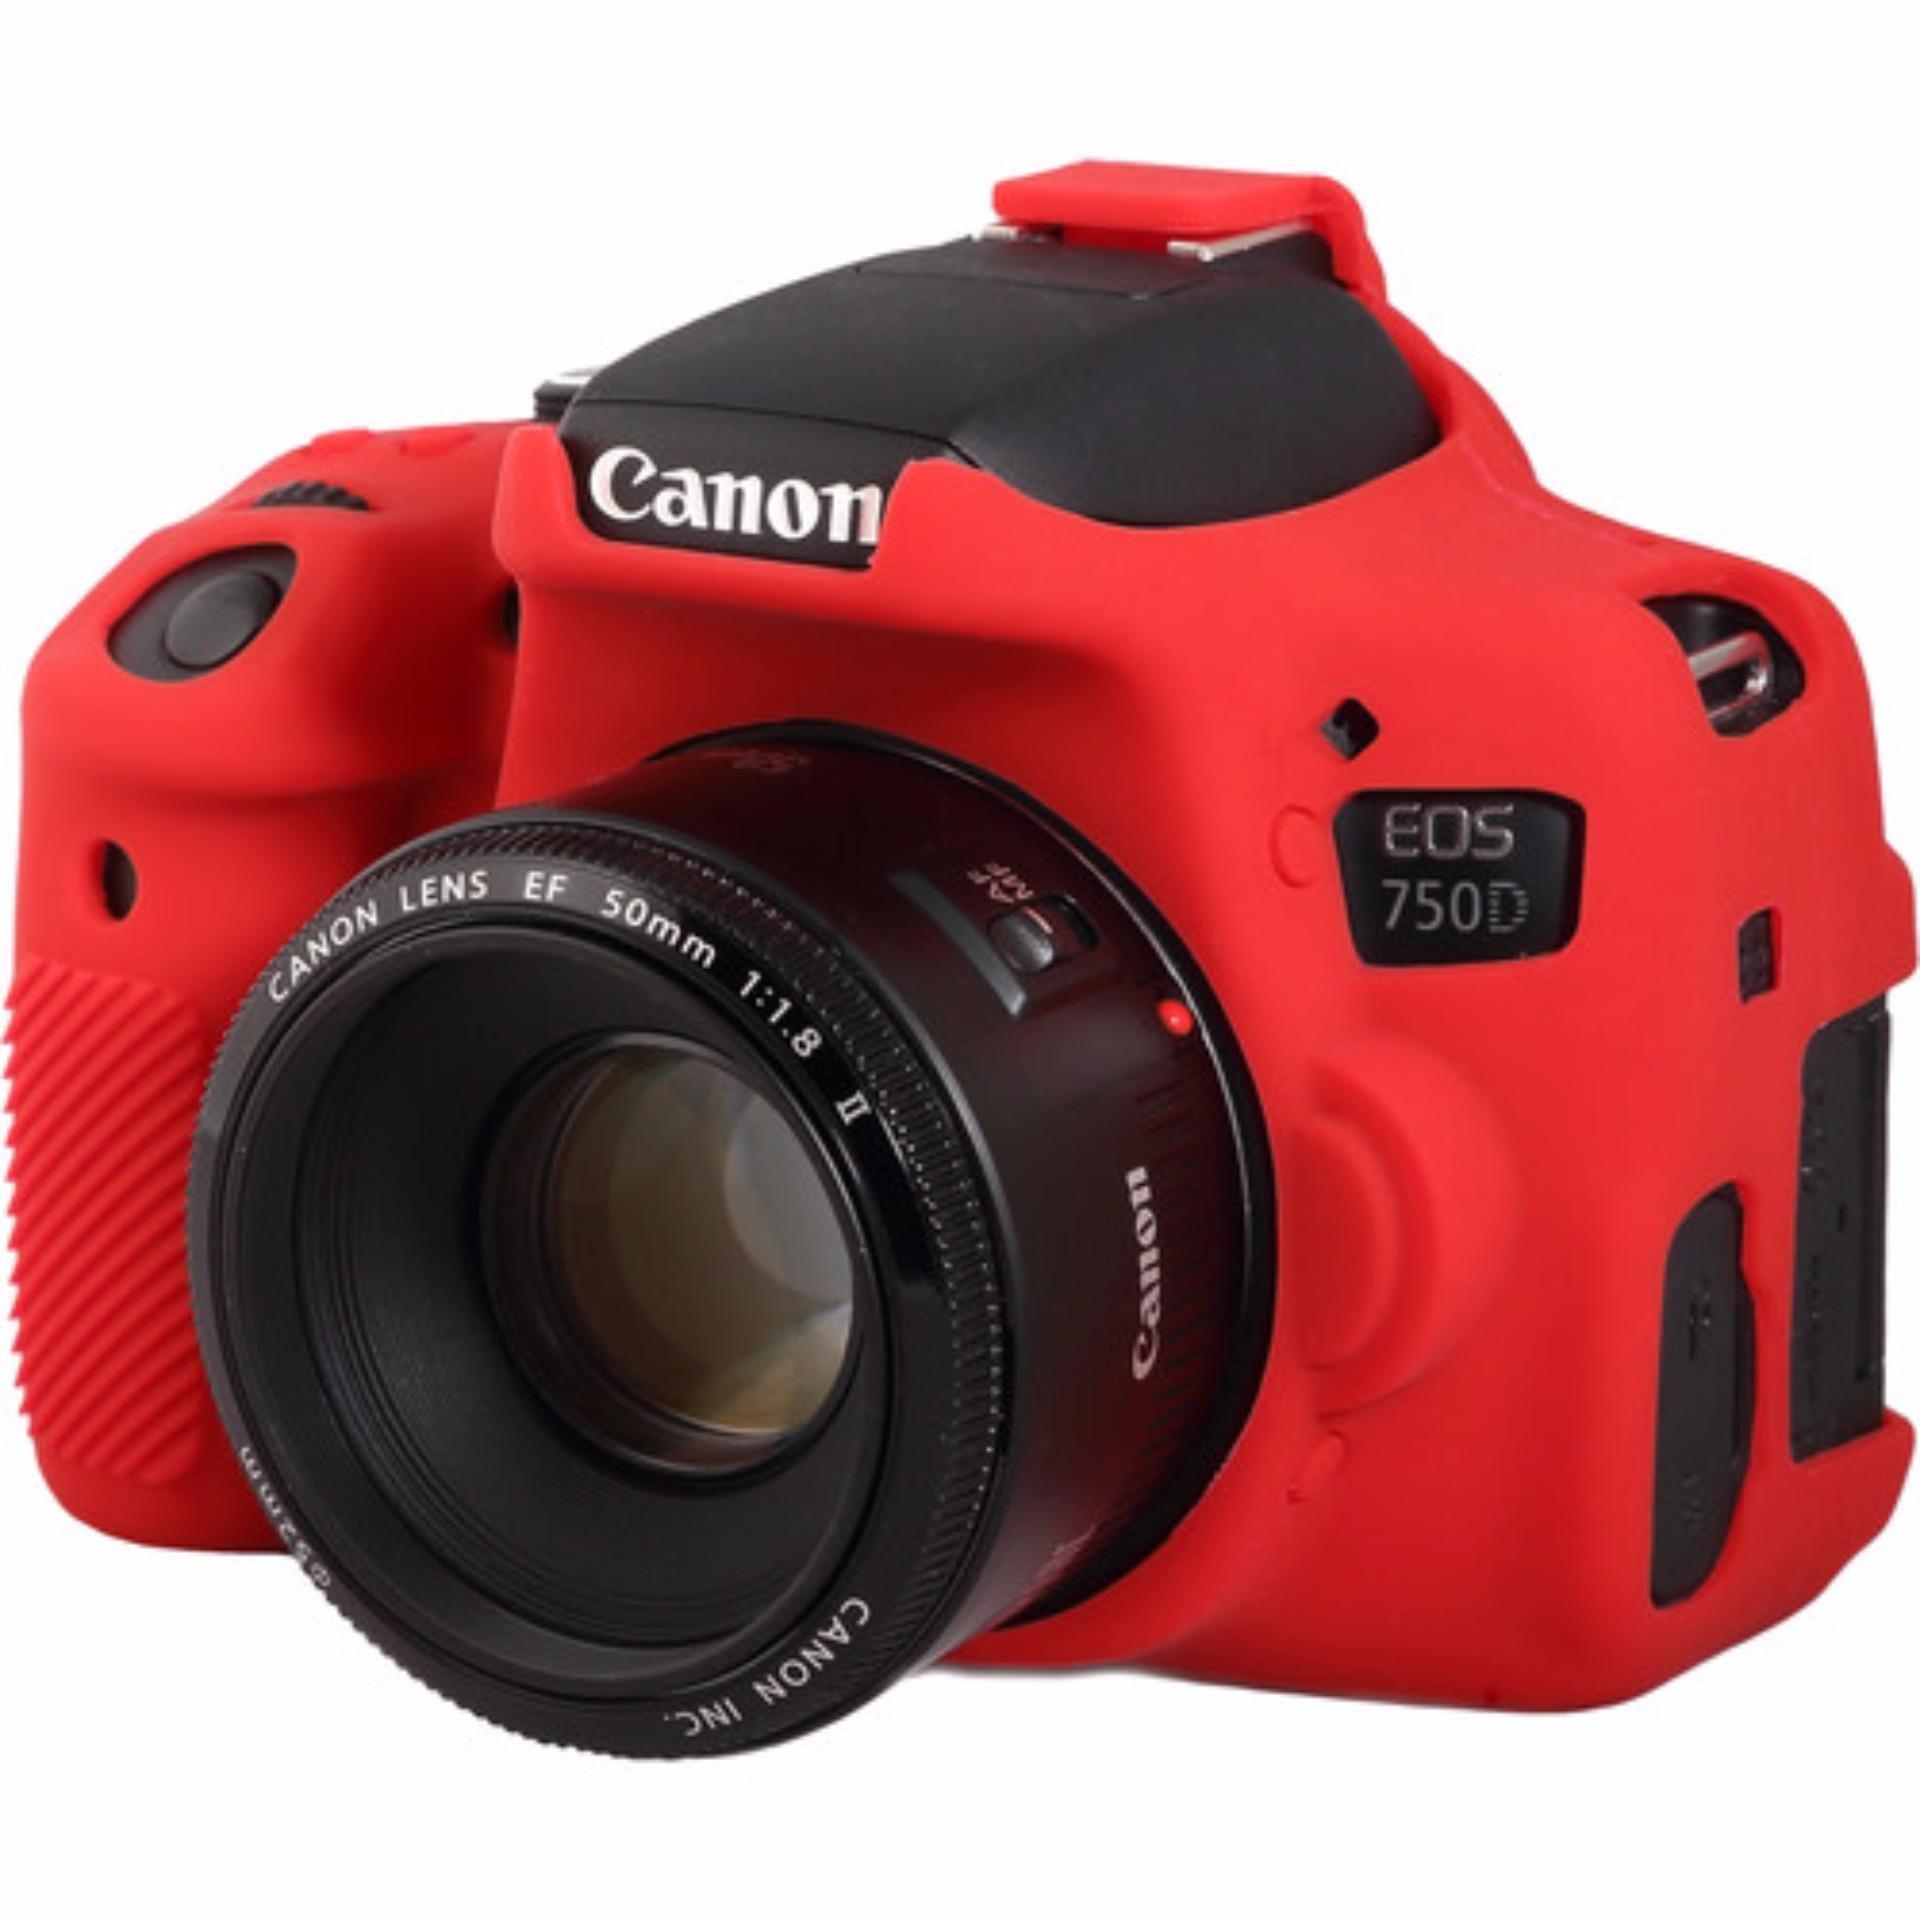 Bao Silicon bảo vệ máy ảnh Easy cover cho Canon 750D (Màu Đỏ)